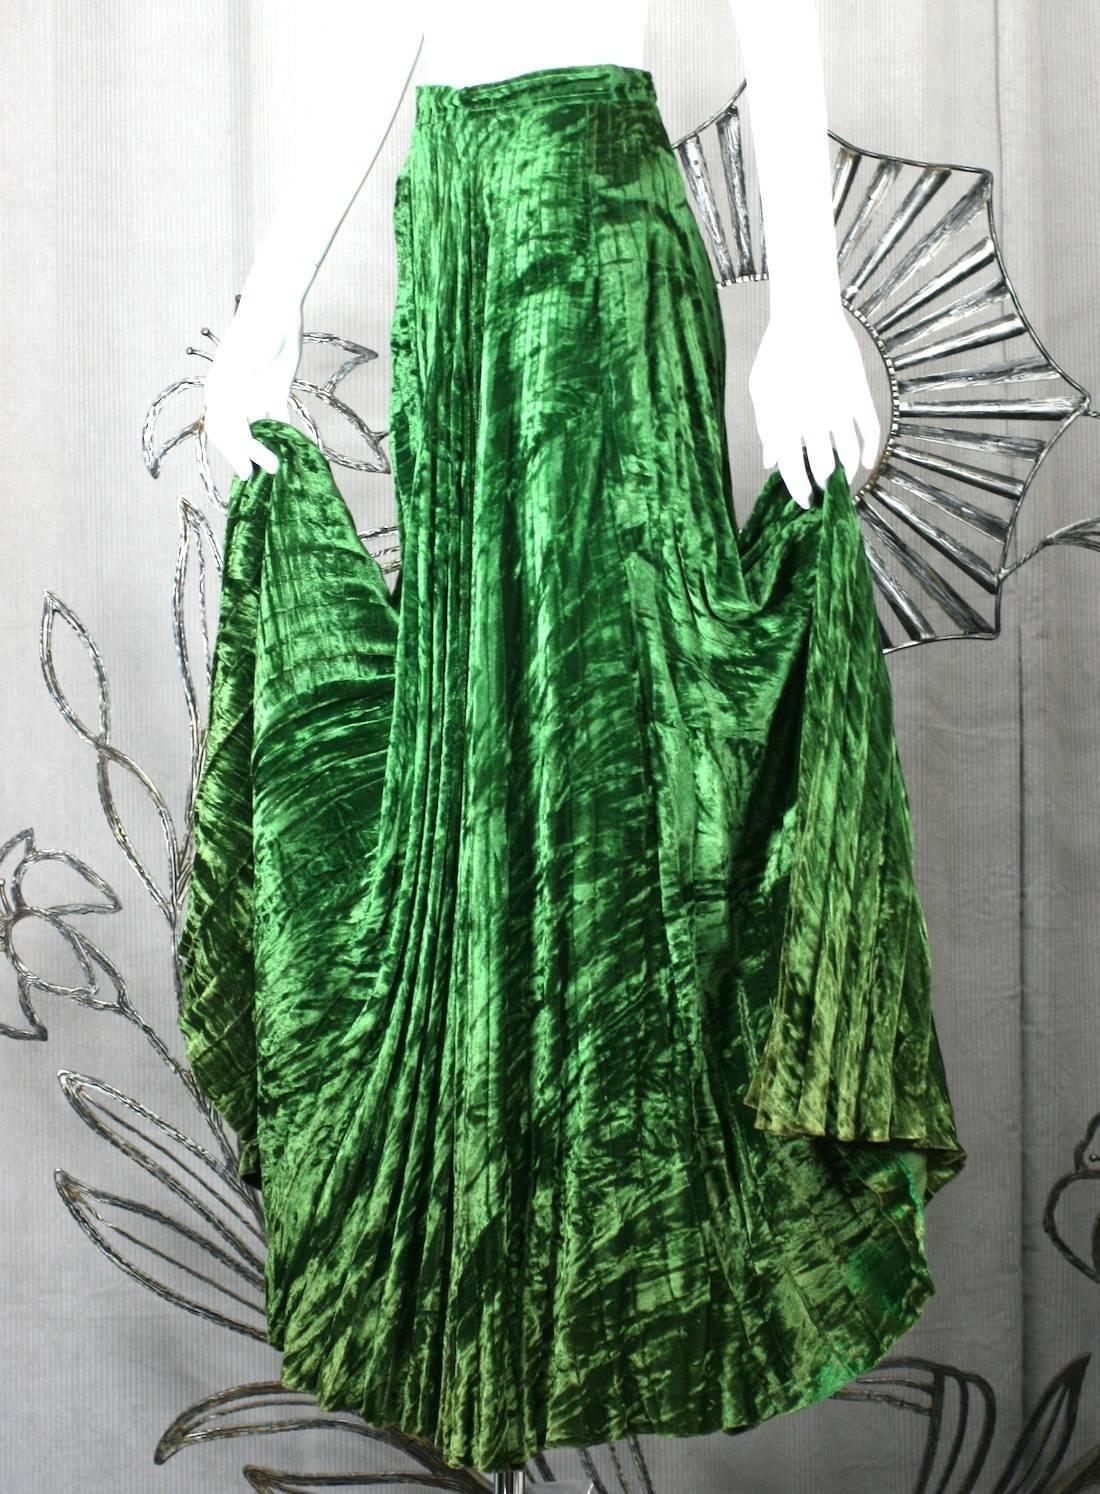 e5b7ebabc Yves Saint Laurent Rive Gauche Panne Velvet Maxi Skirt   From a collection  of rare vintage